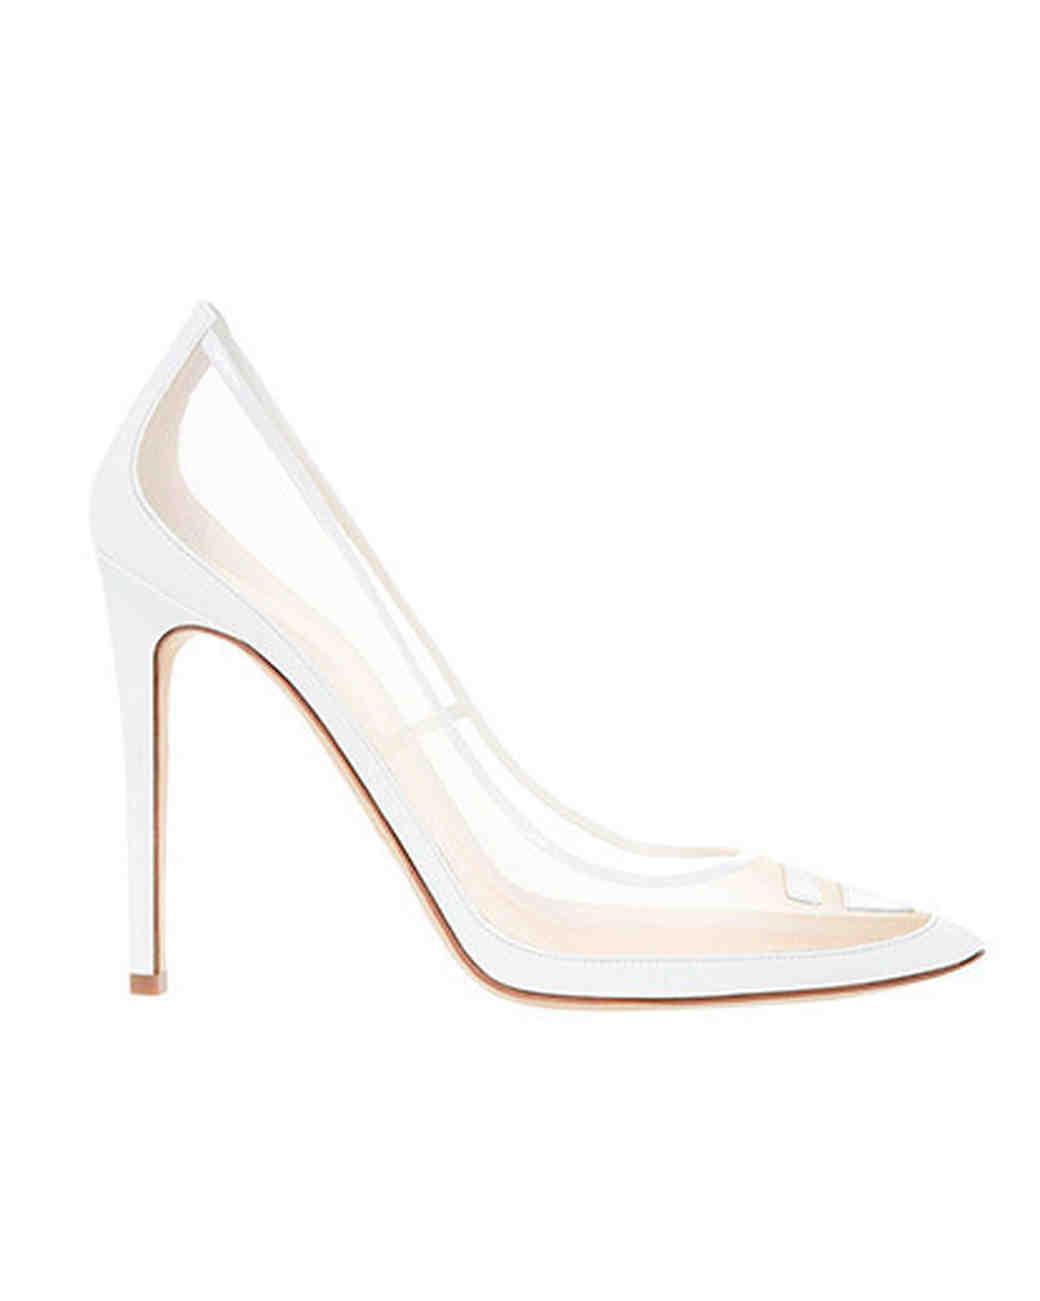 mesh-wedding-shoes-alejandro-ingelmo-tron-pump-white-0315.jpg